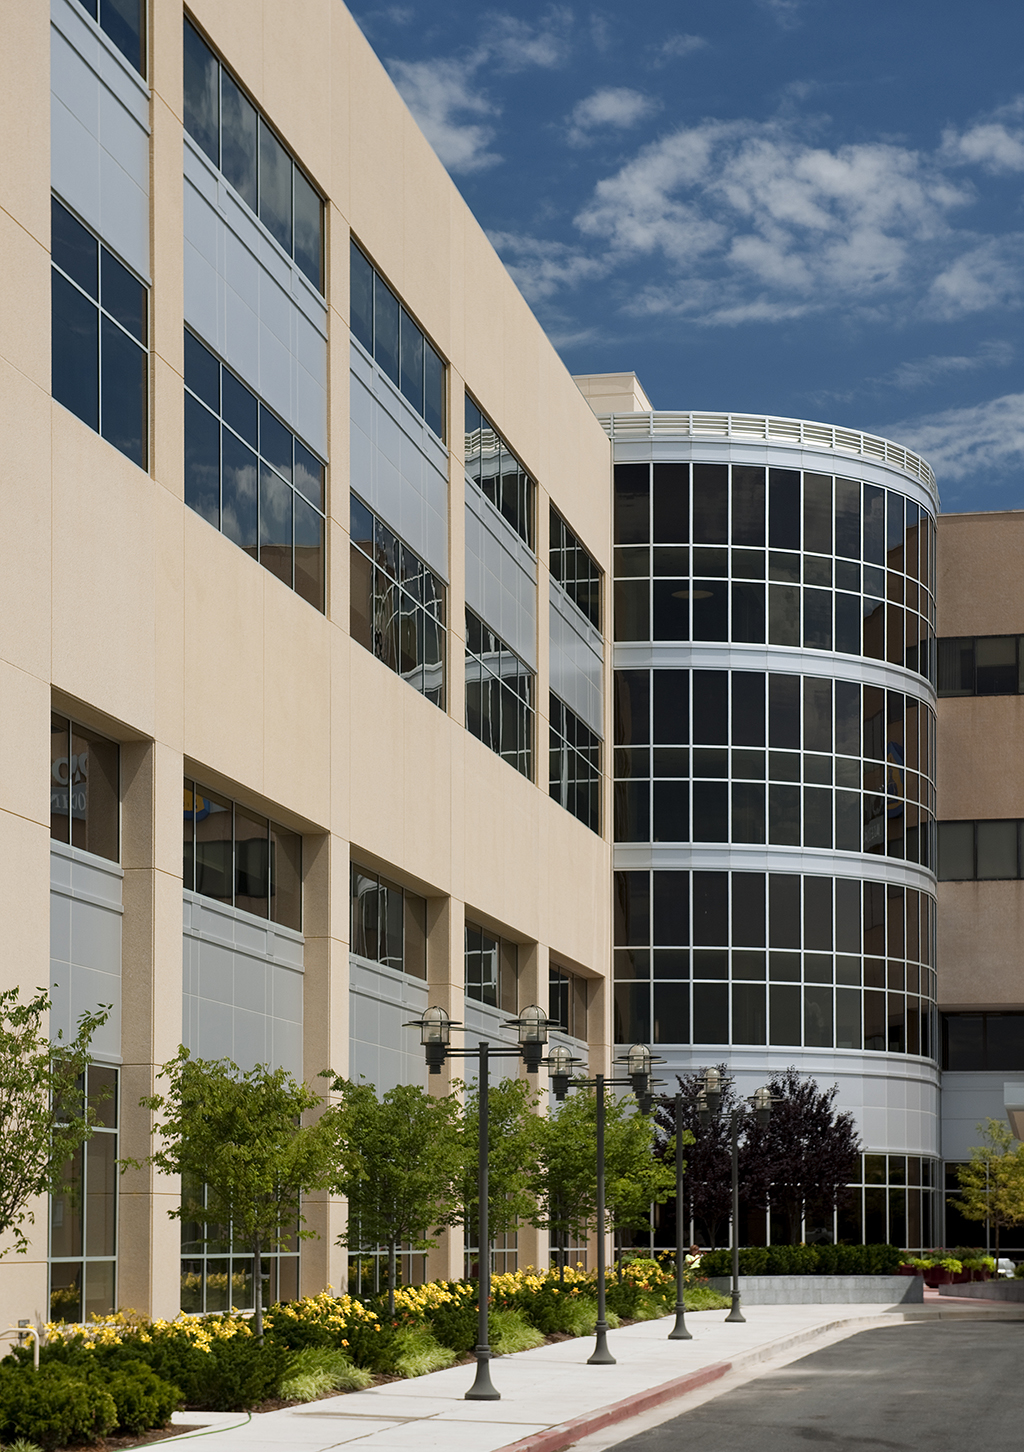 Howard County General Hospital